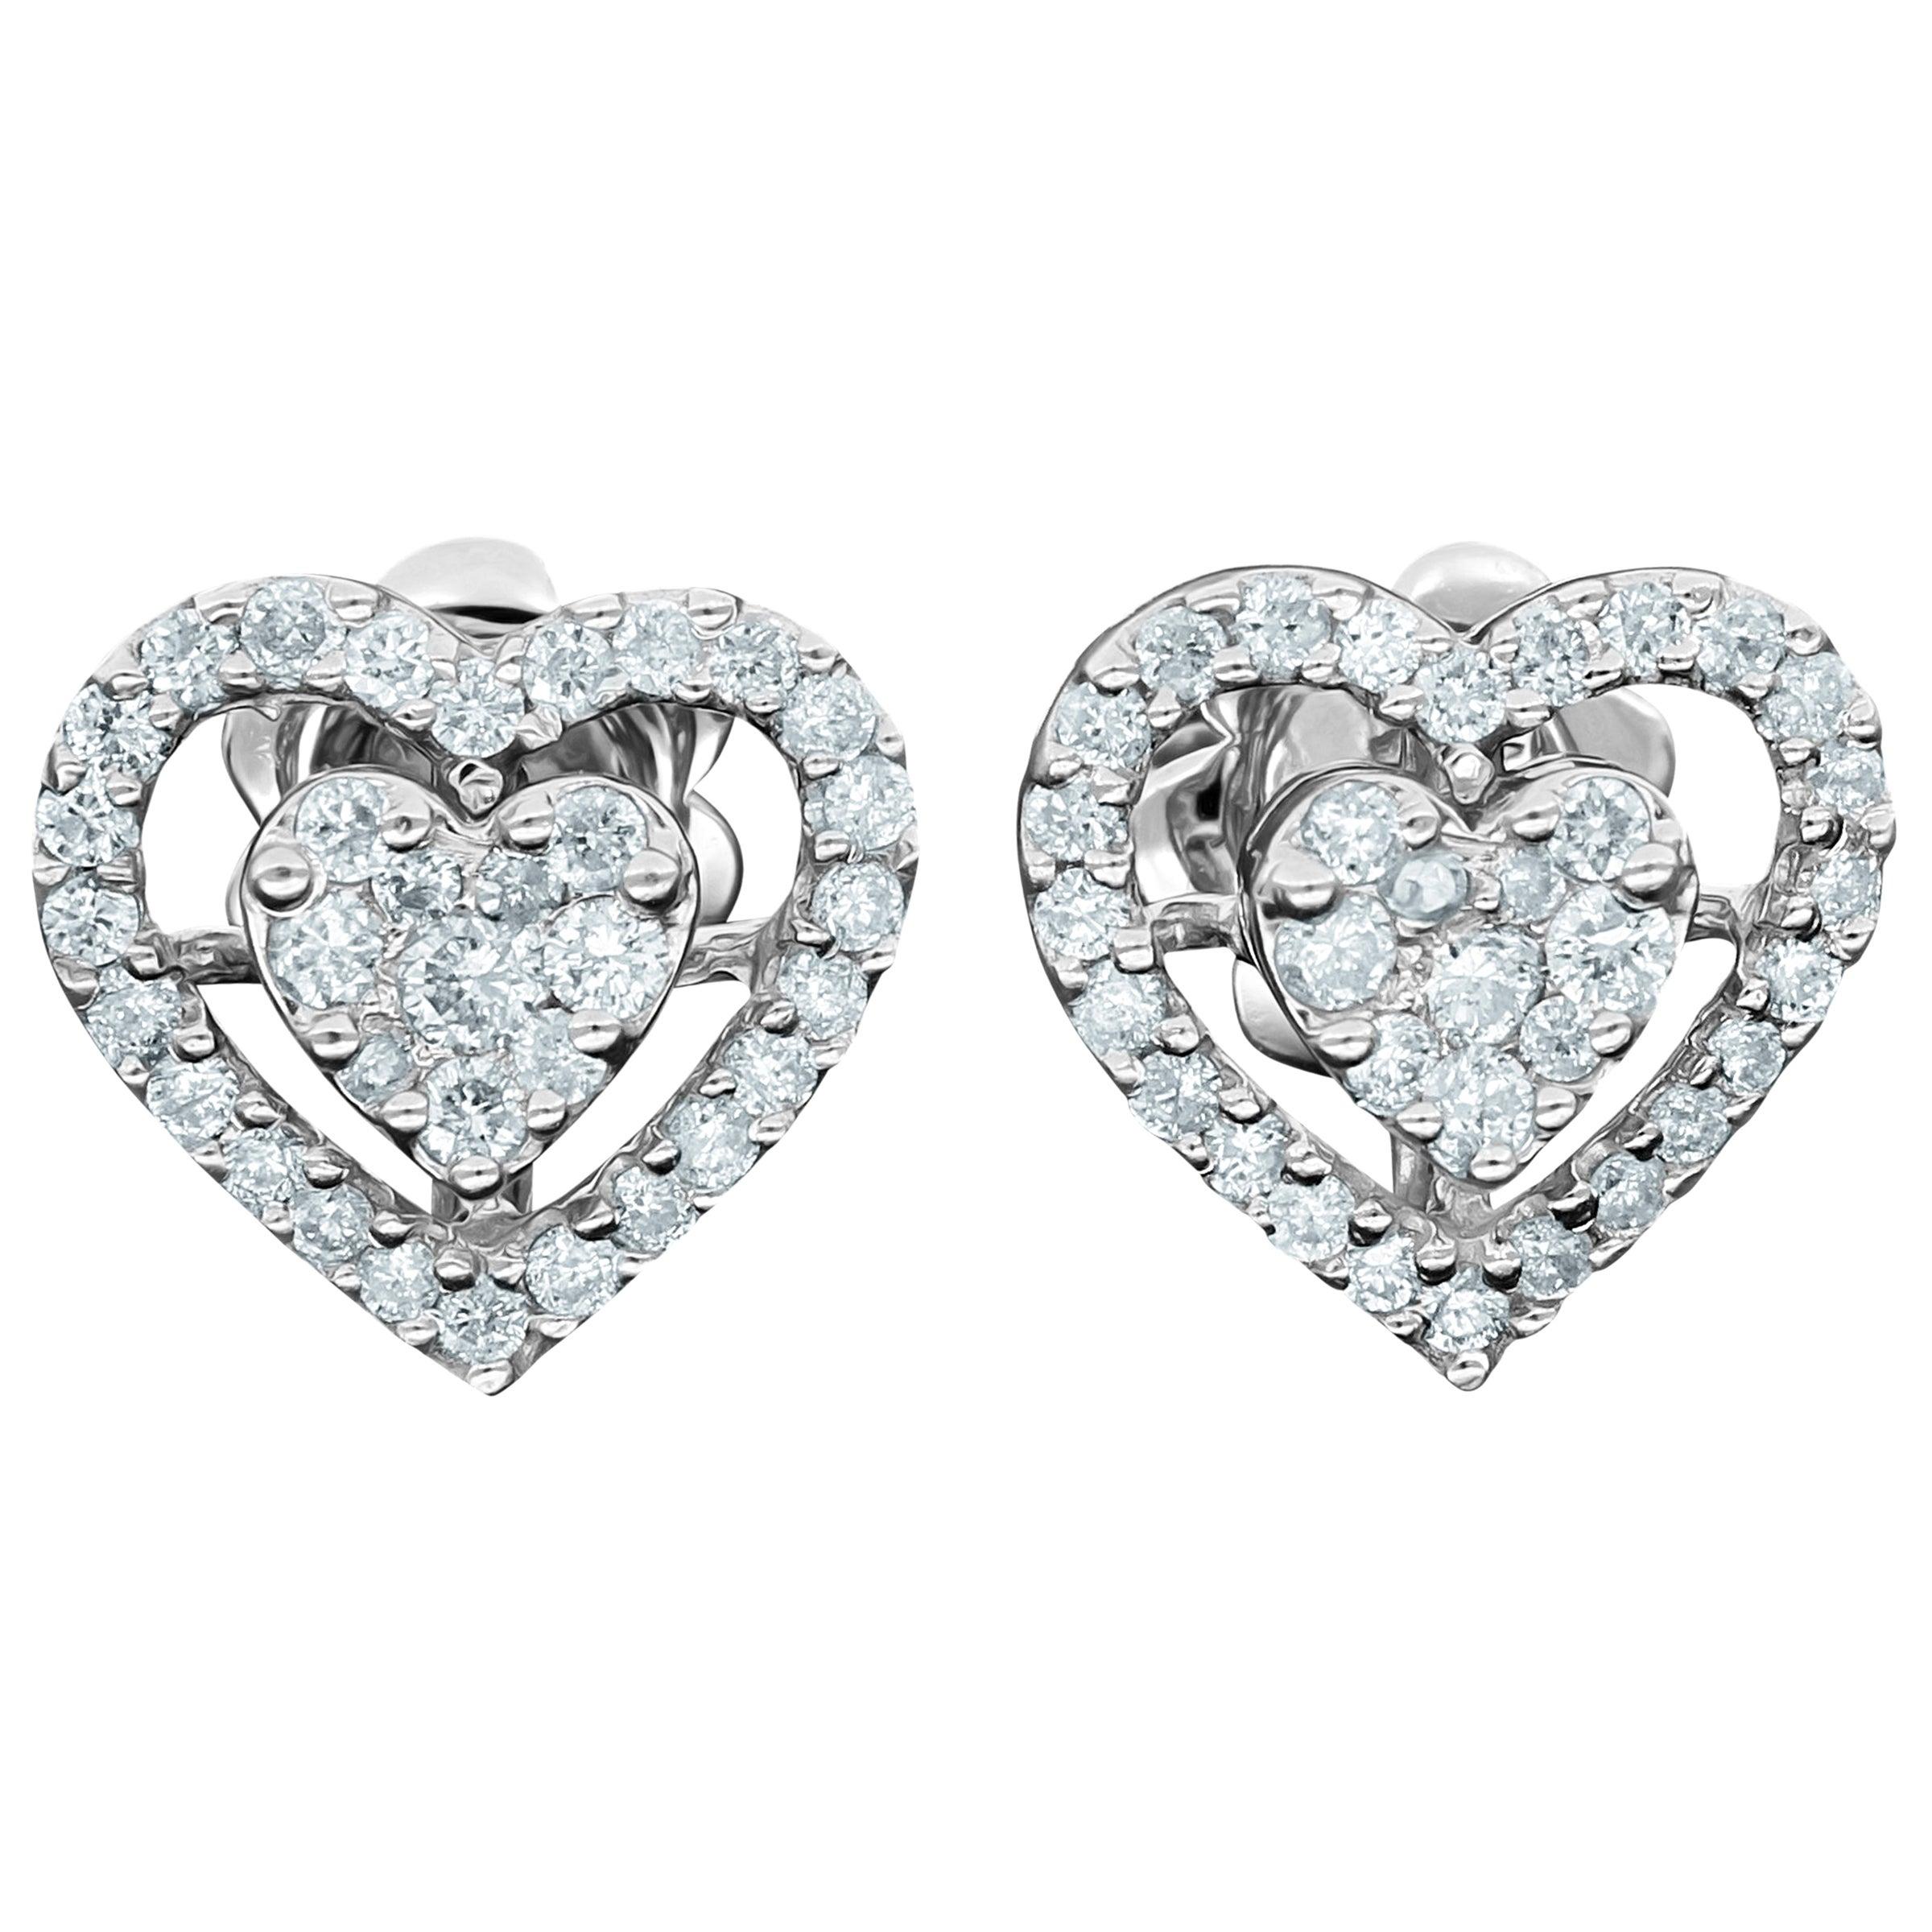 Amwaj White Gold 18 Karat Earring with Diamonds